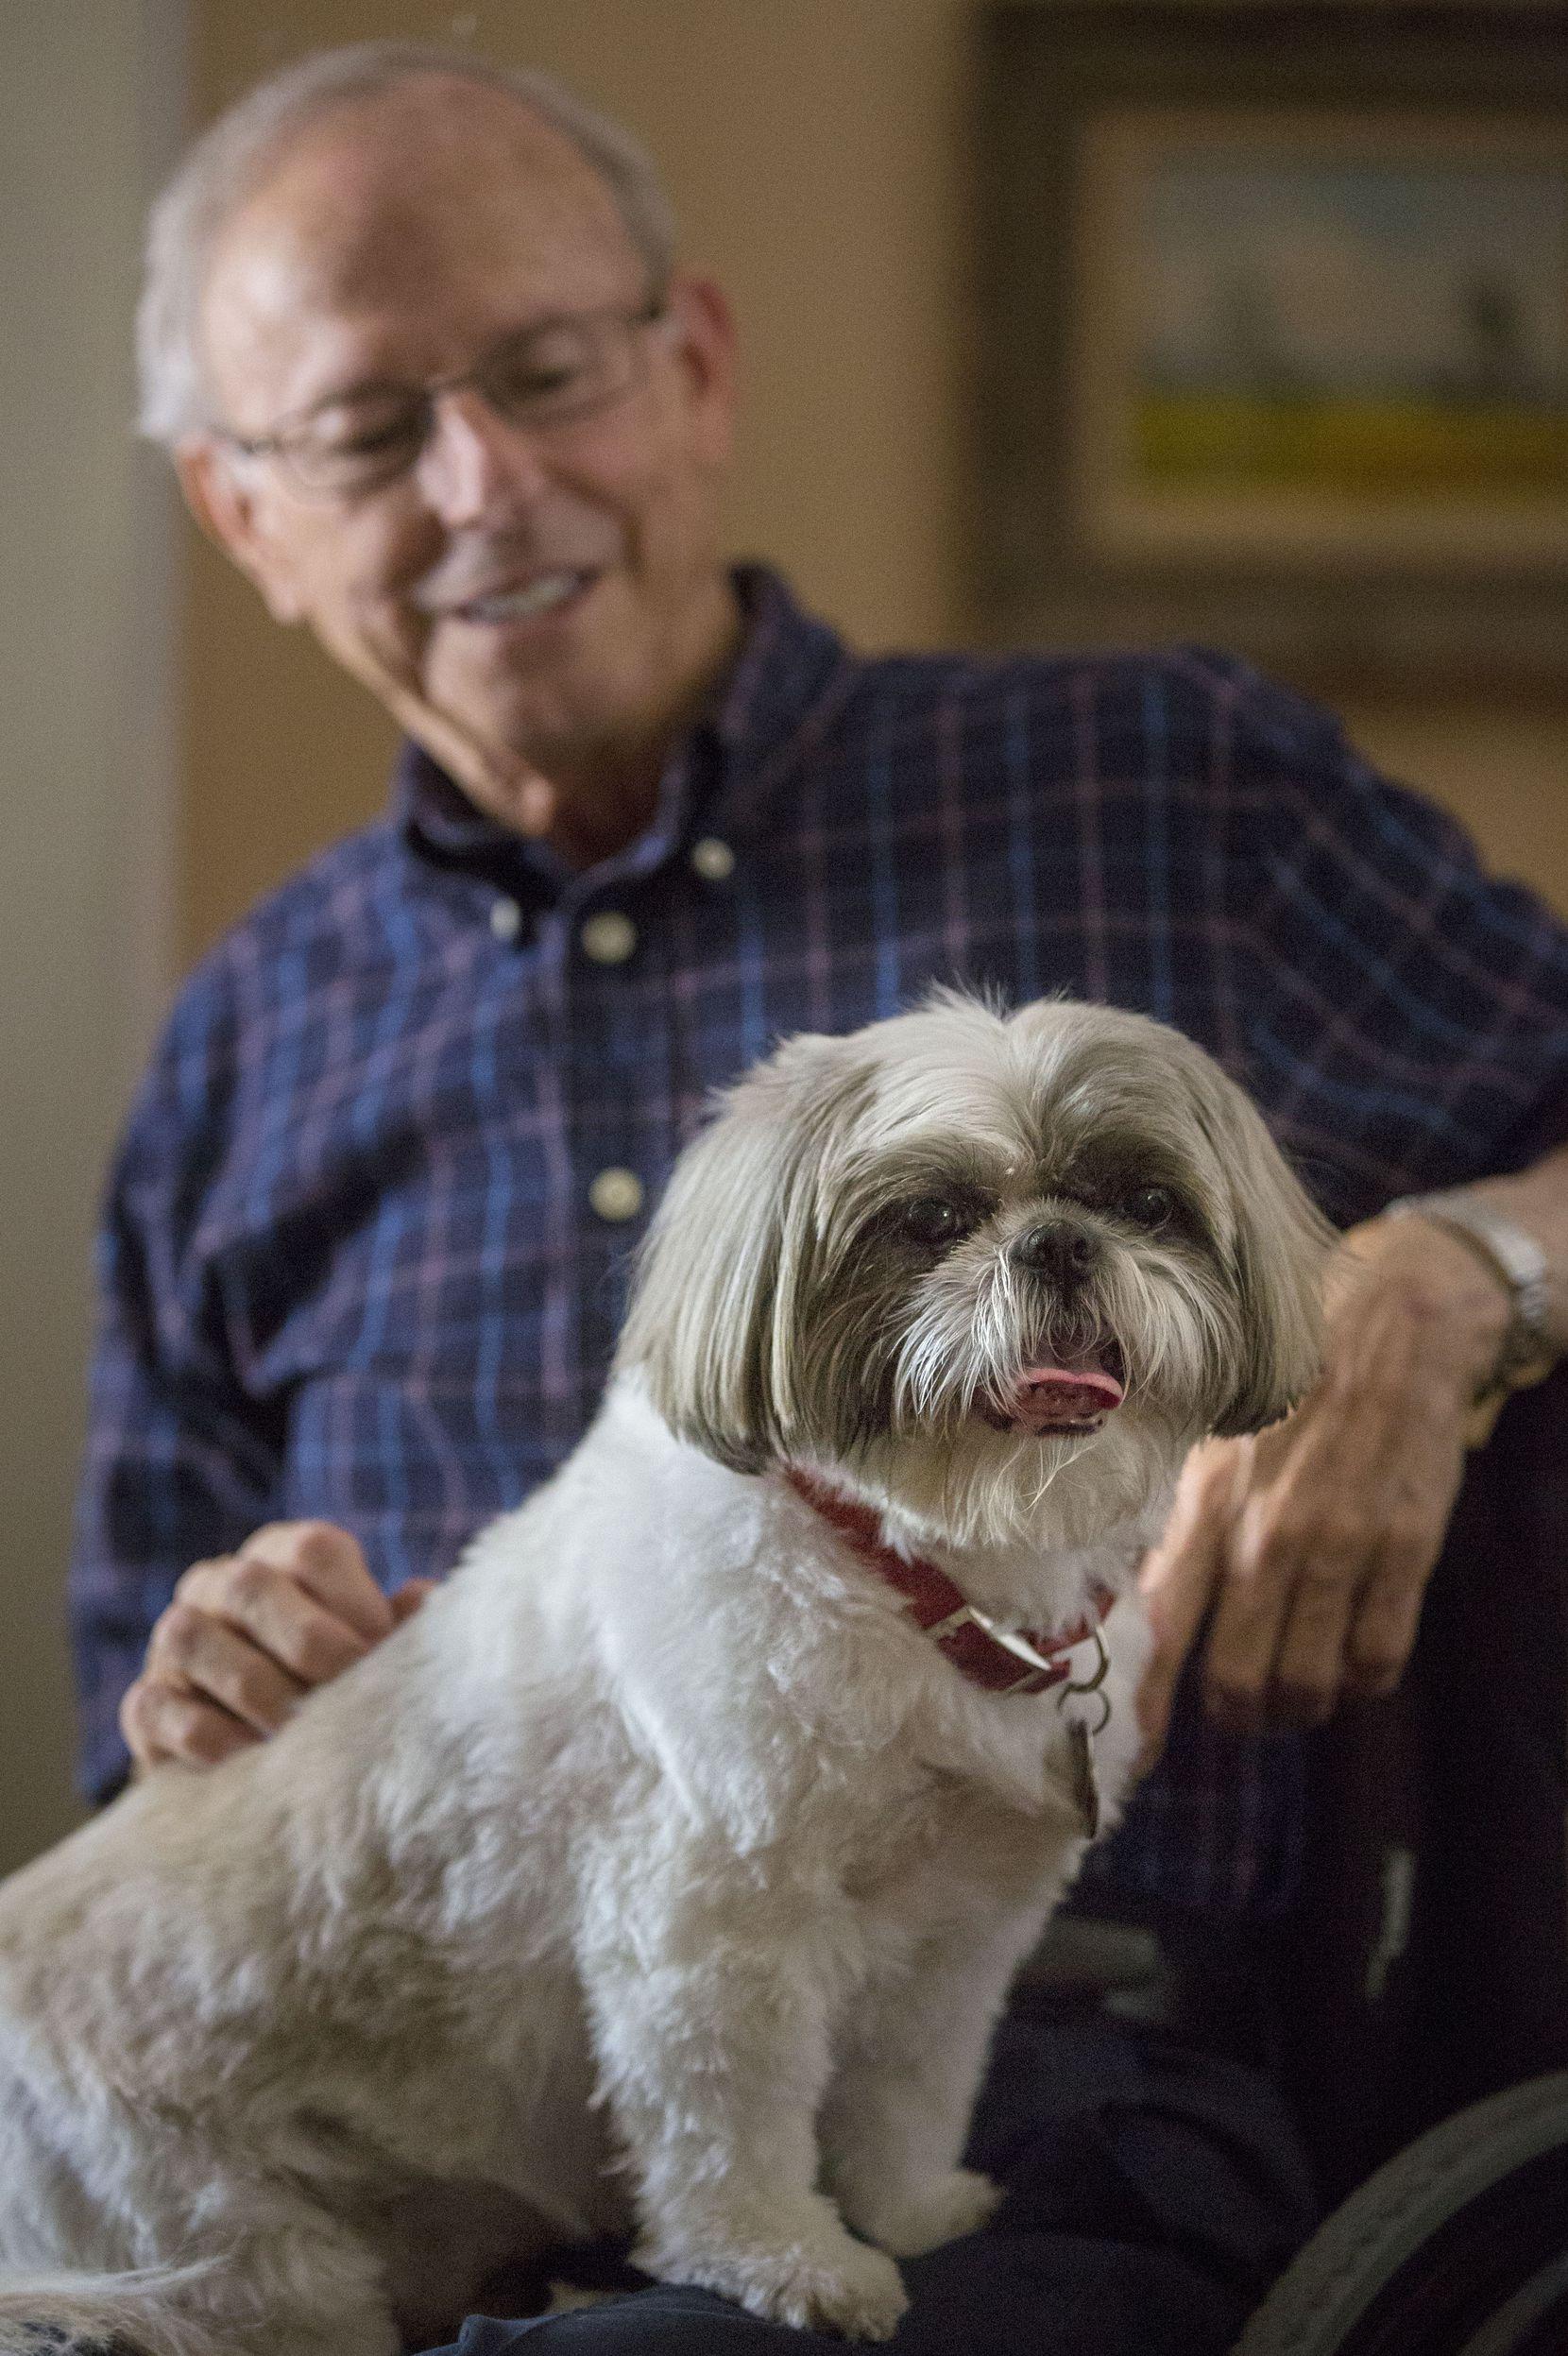 Don Rorschach and his dog, Orli, at Rorschach's home in Irving, Texas.